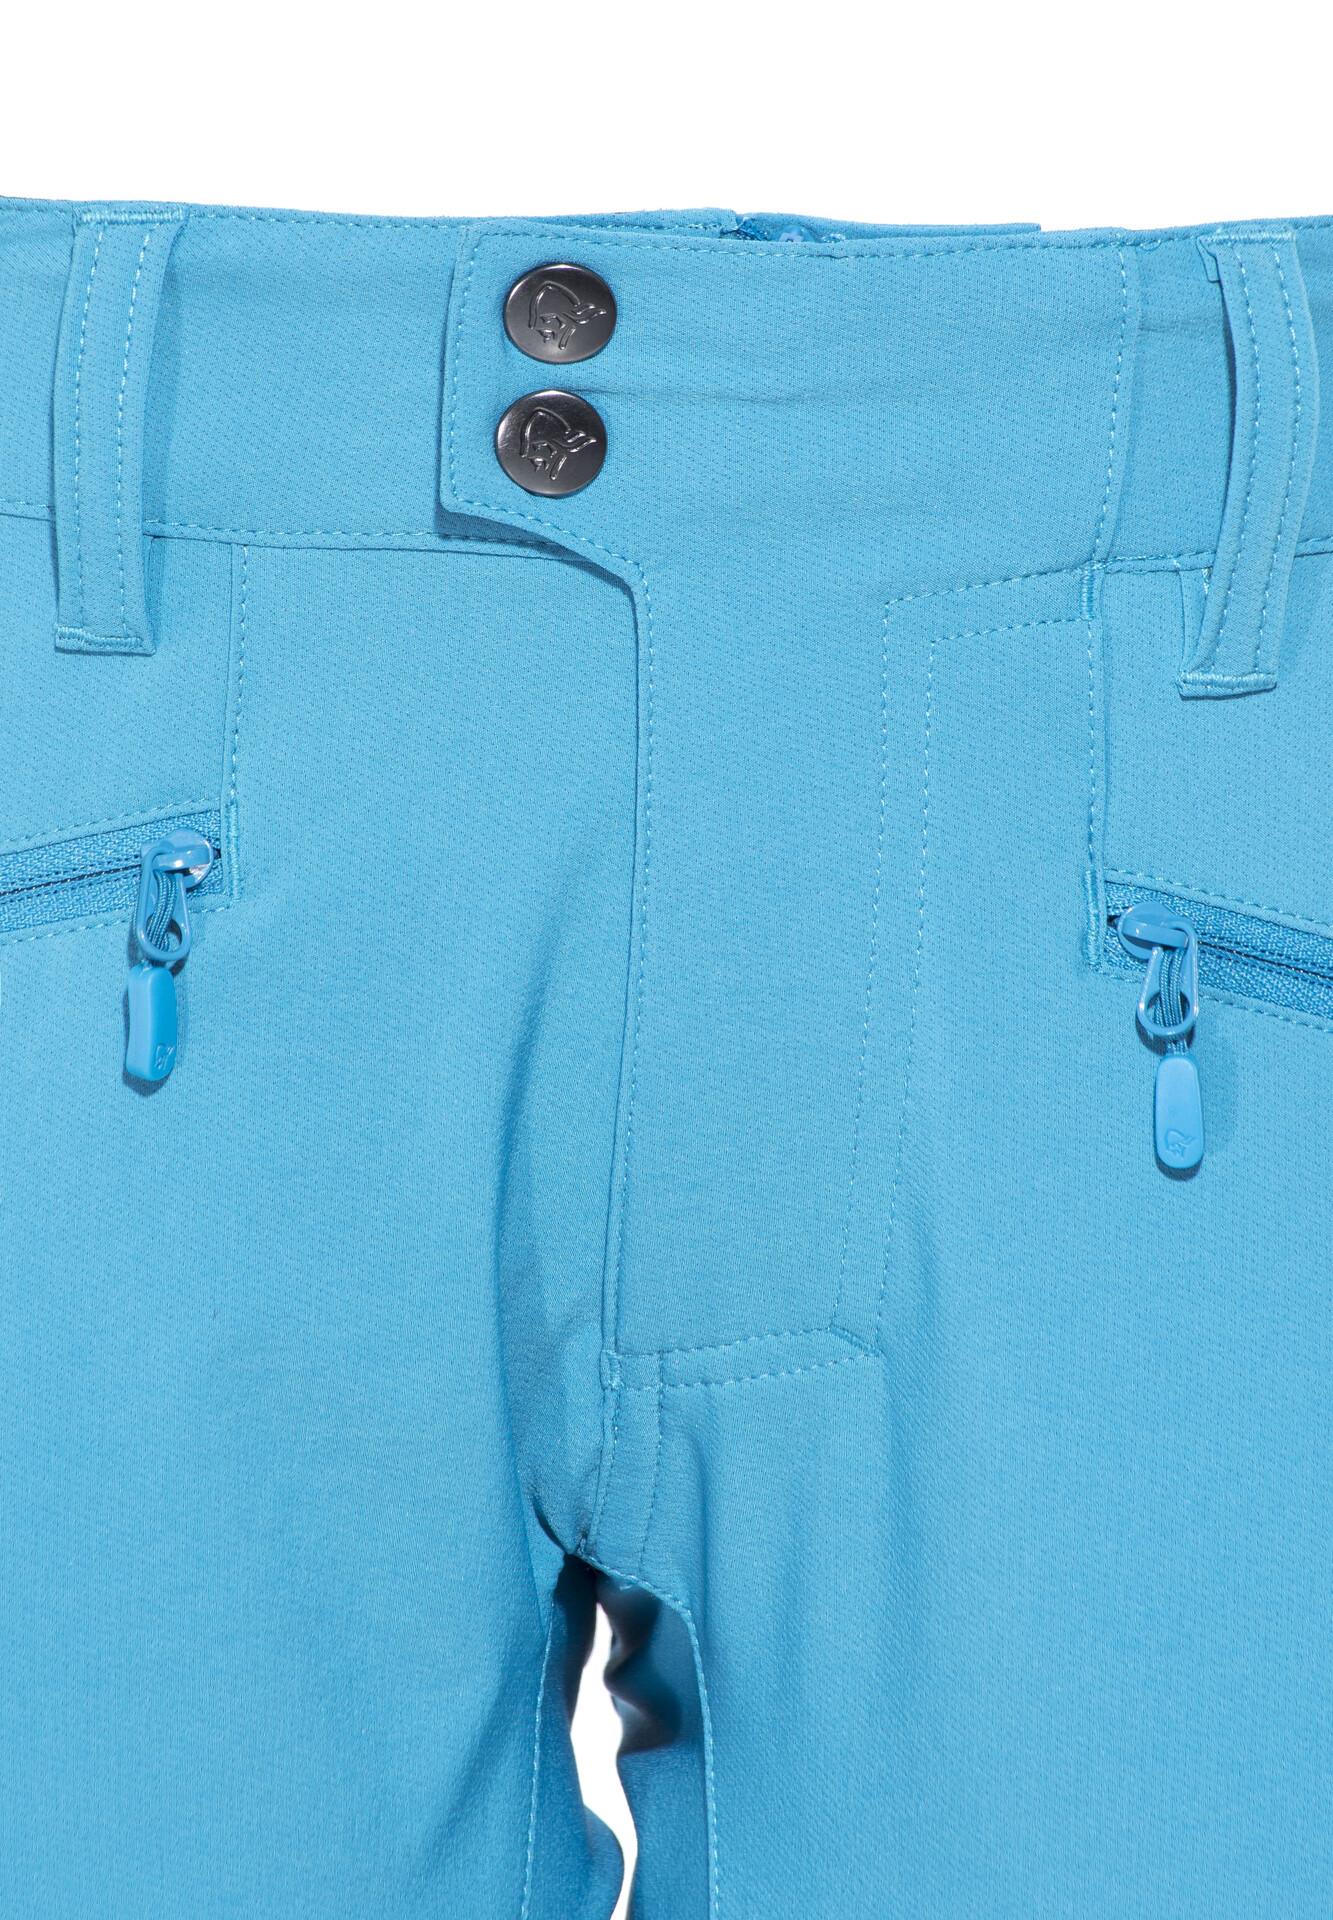 es Mujer Flex1 Trekking De Falketind Azul Pantalones Norrøna Campz SOXw8PqP